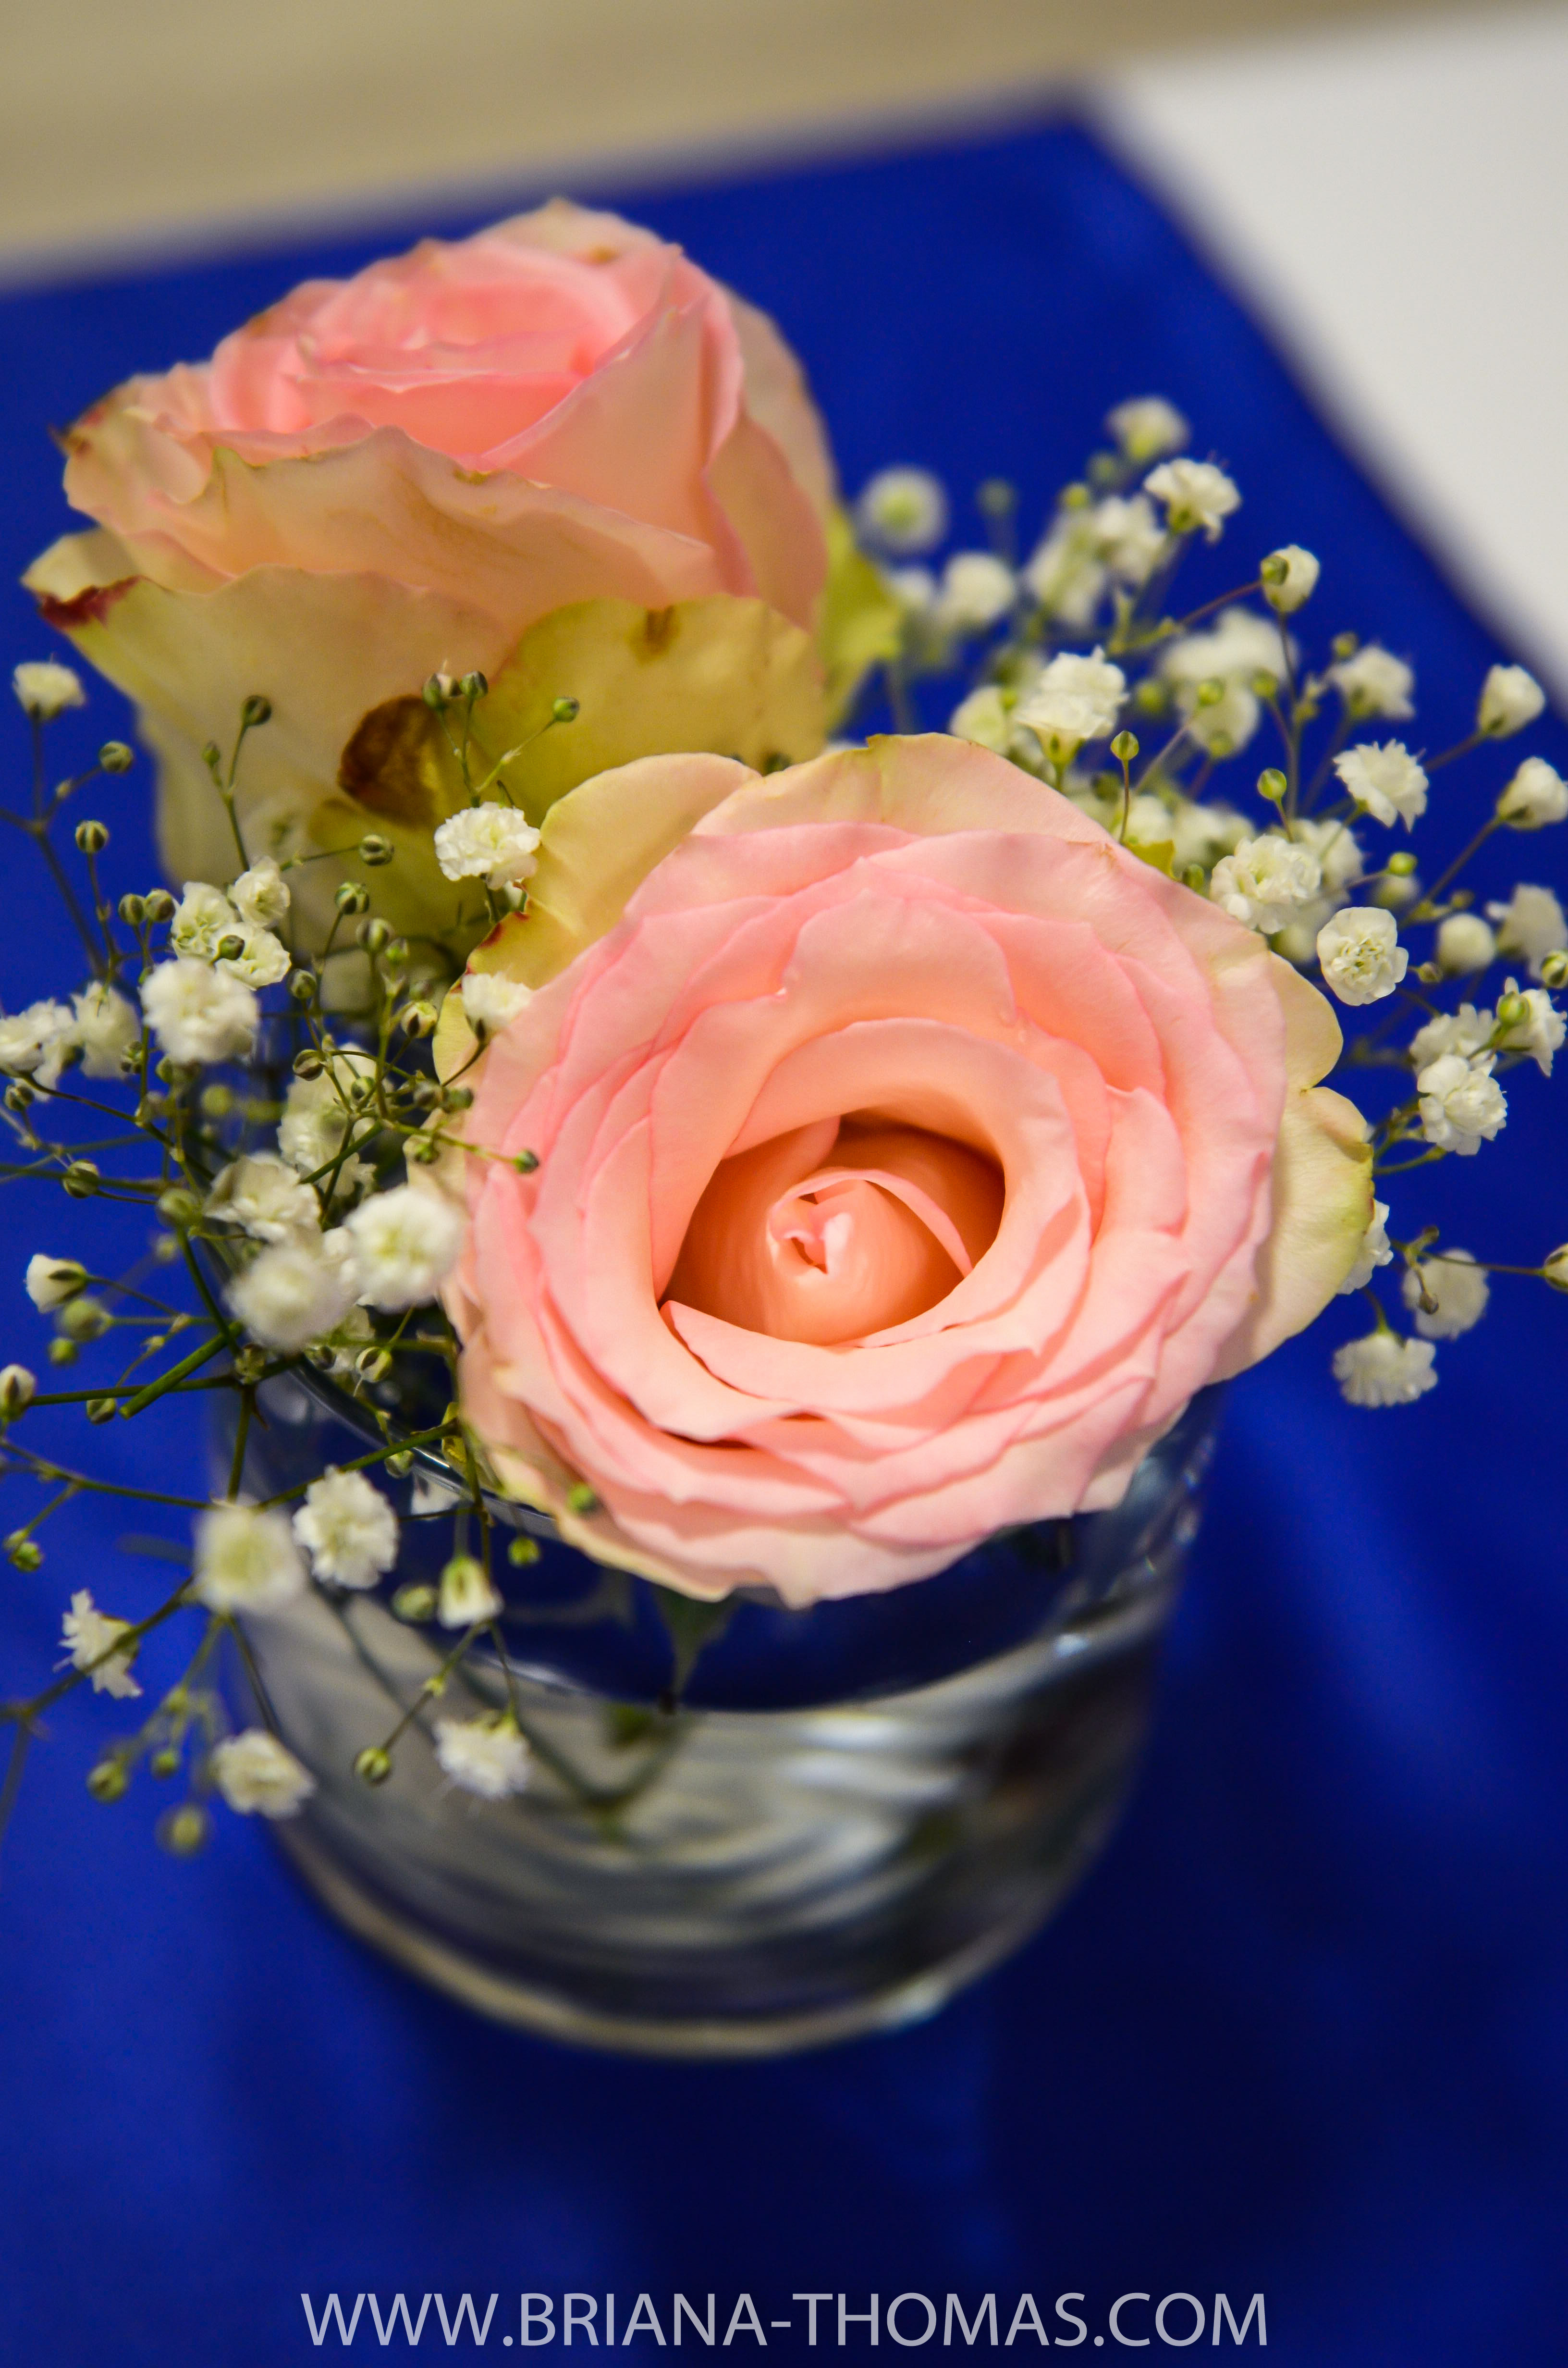 Ryan & Briana: Wedding Reception Singing